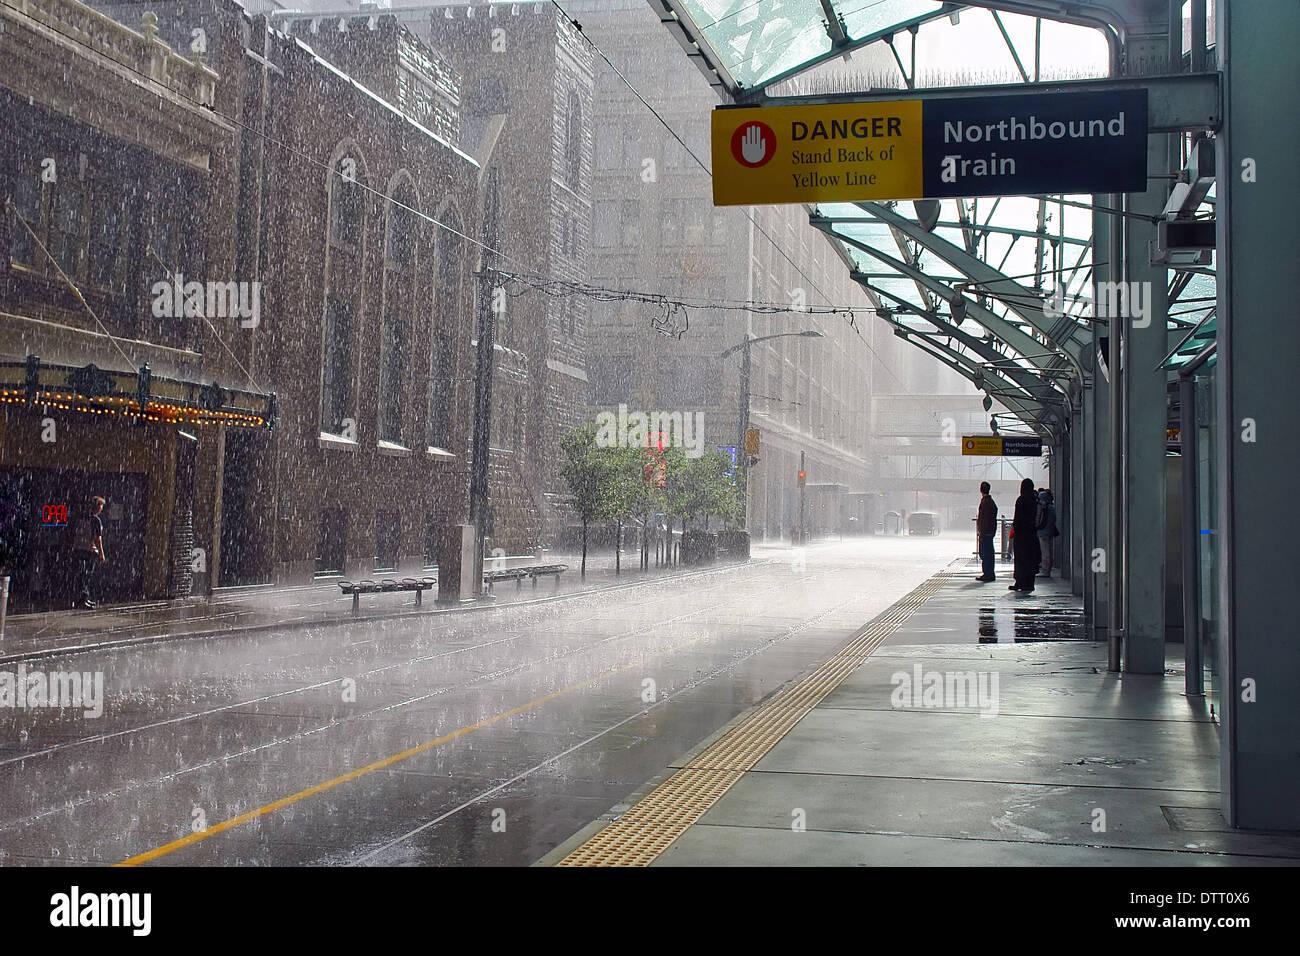 Rain in Calgary, Canada - Stock Image